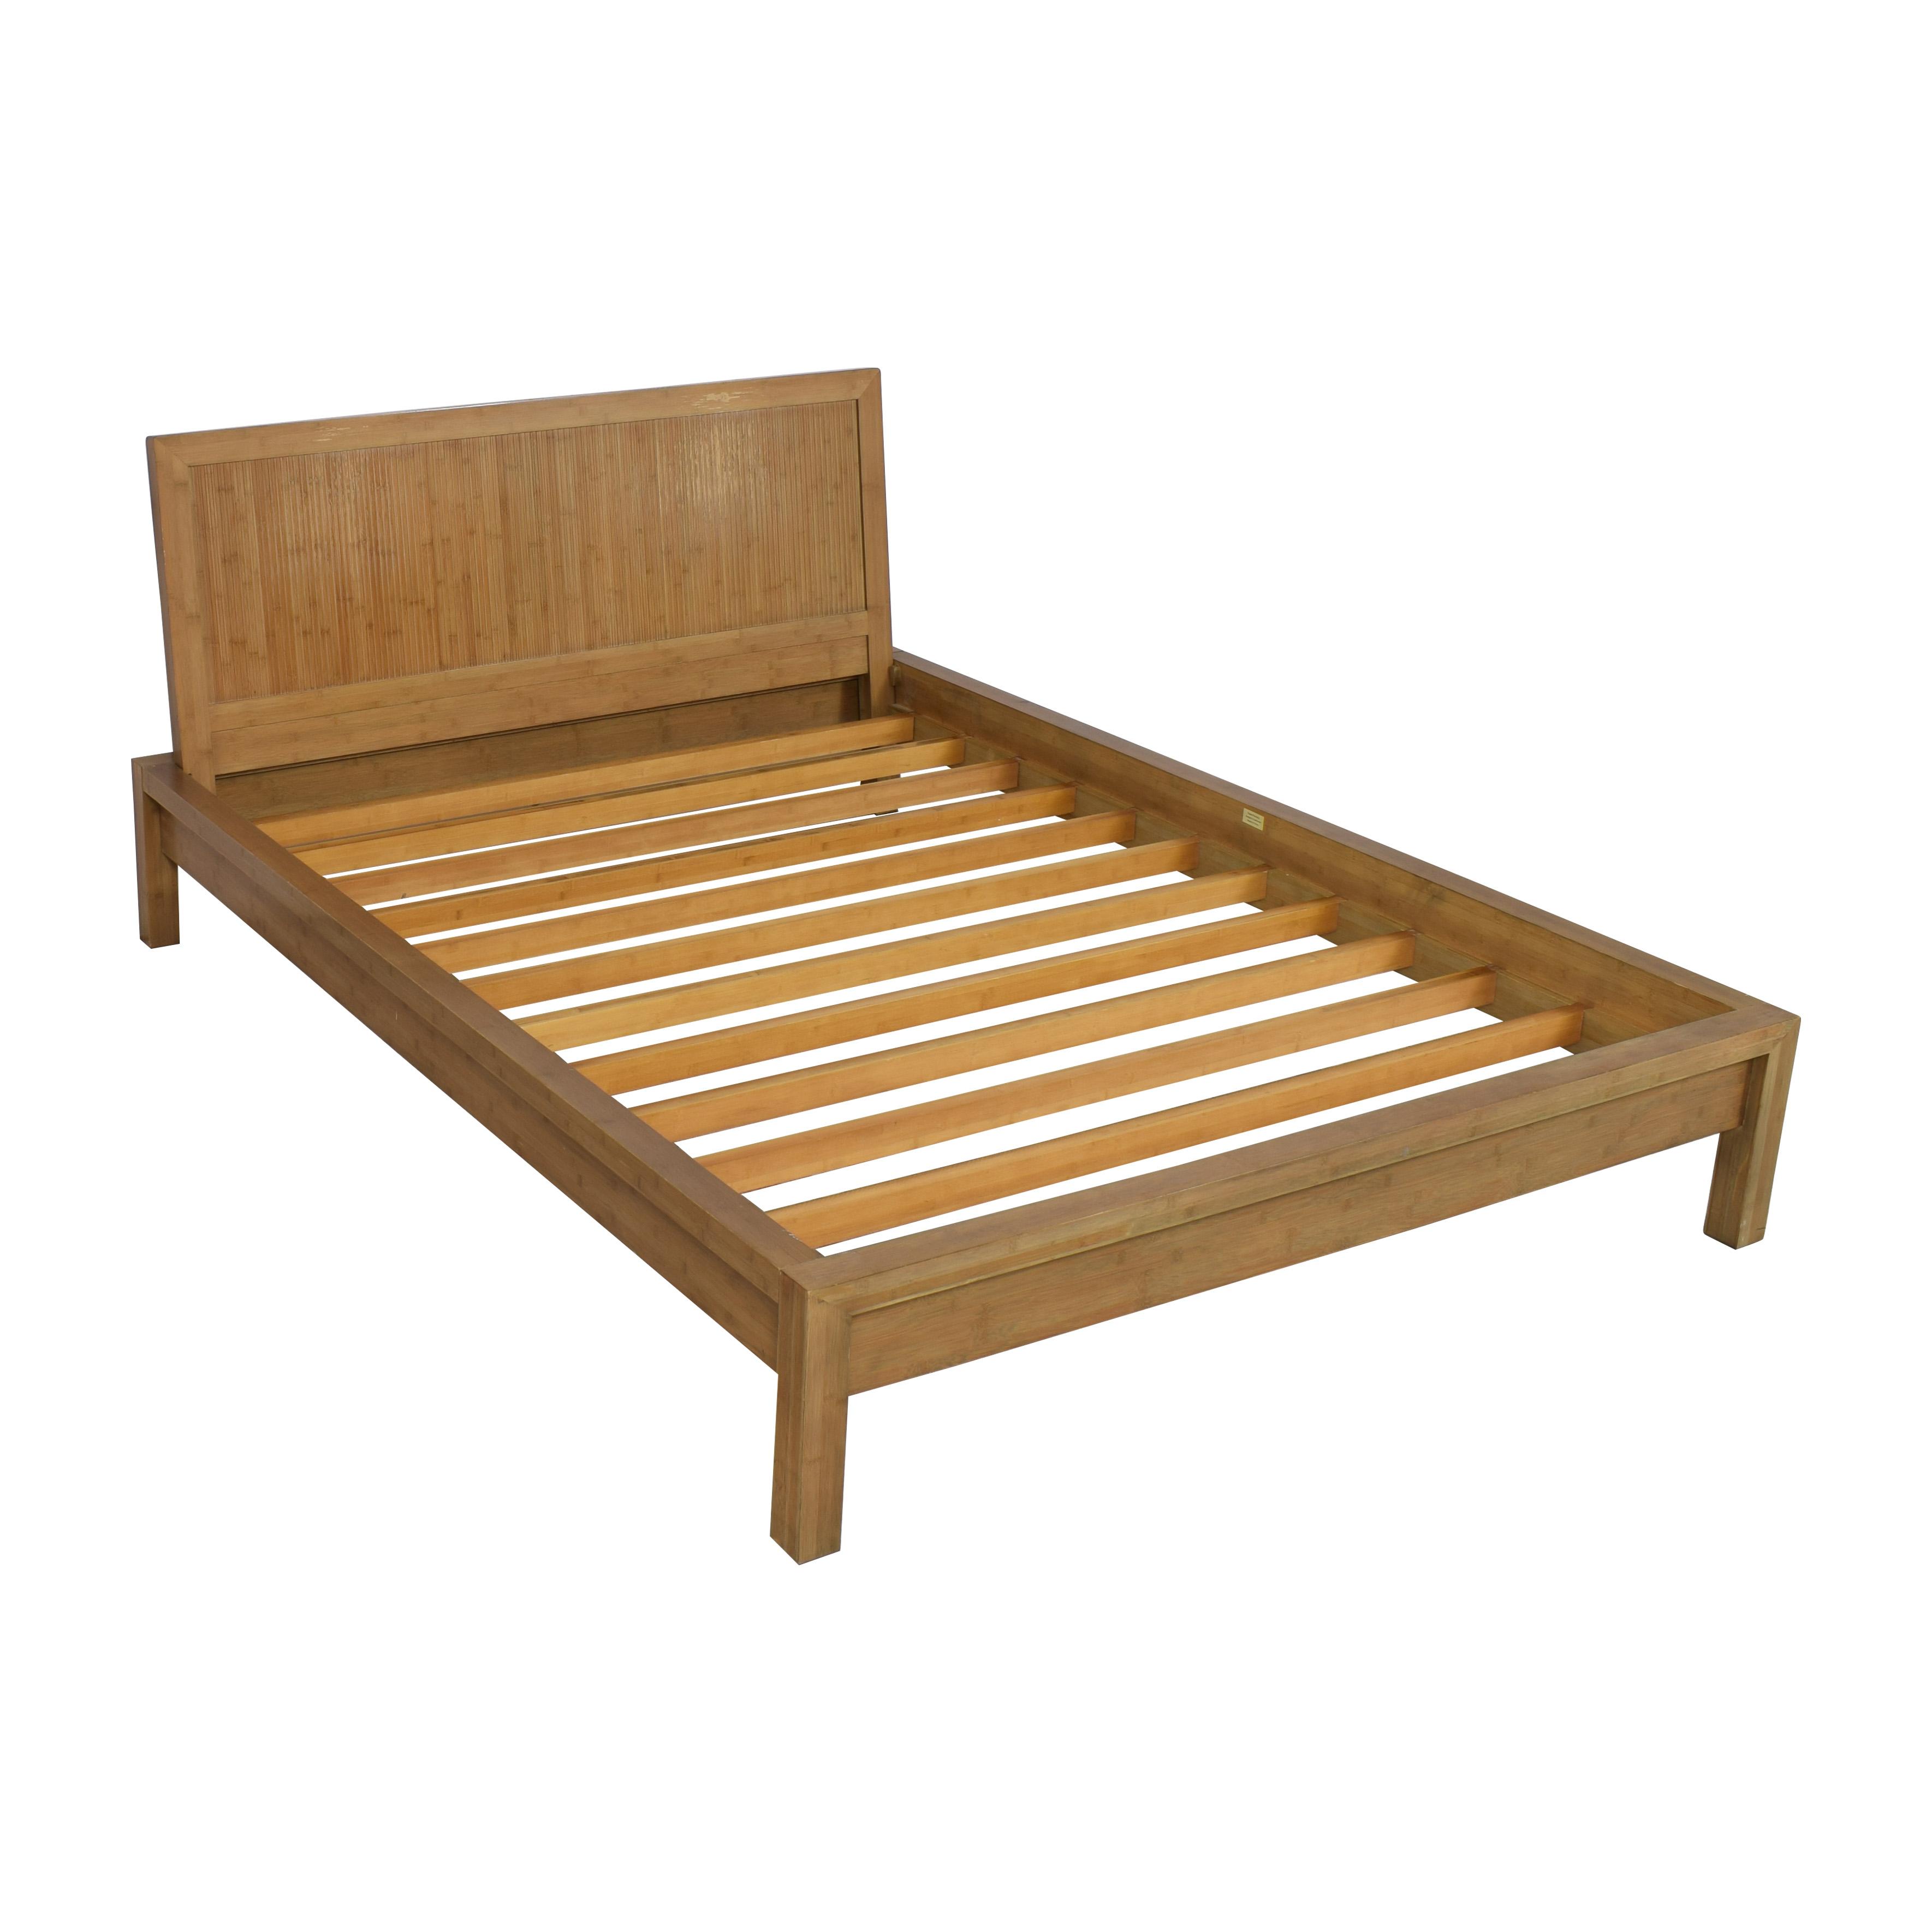 Room & Board Room & Board Queen Bamboo Timbre Maria Yee Platform Bed nyc